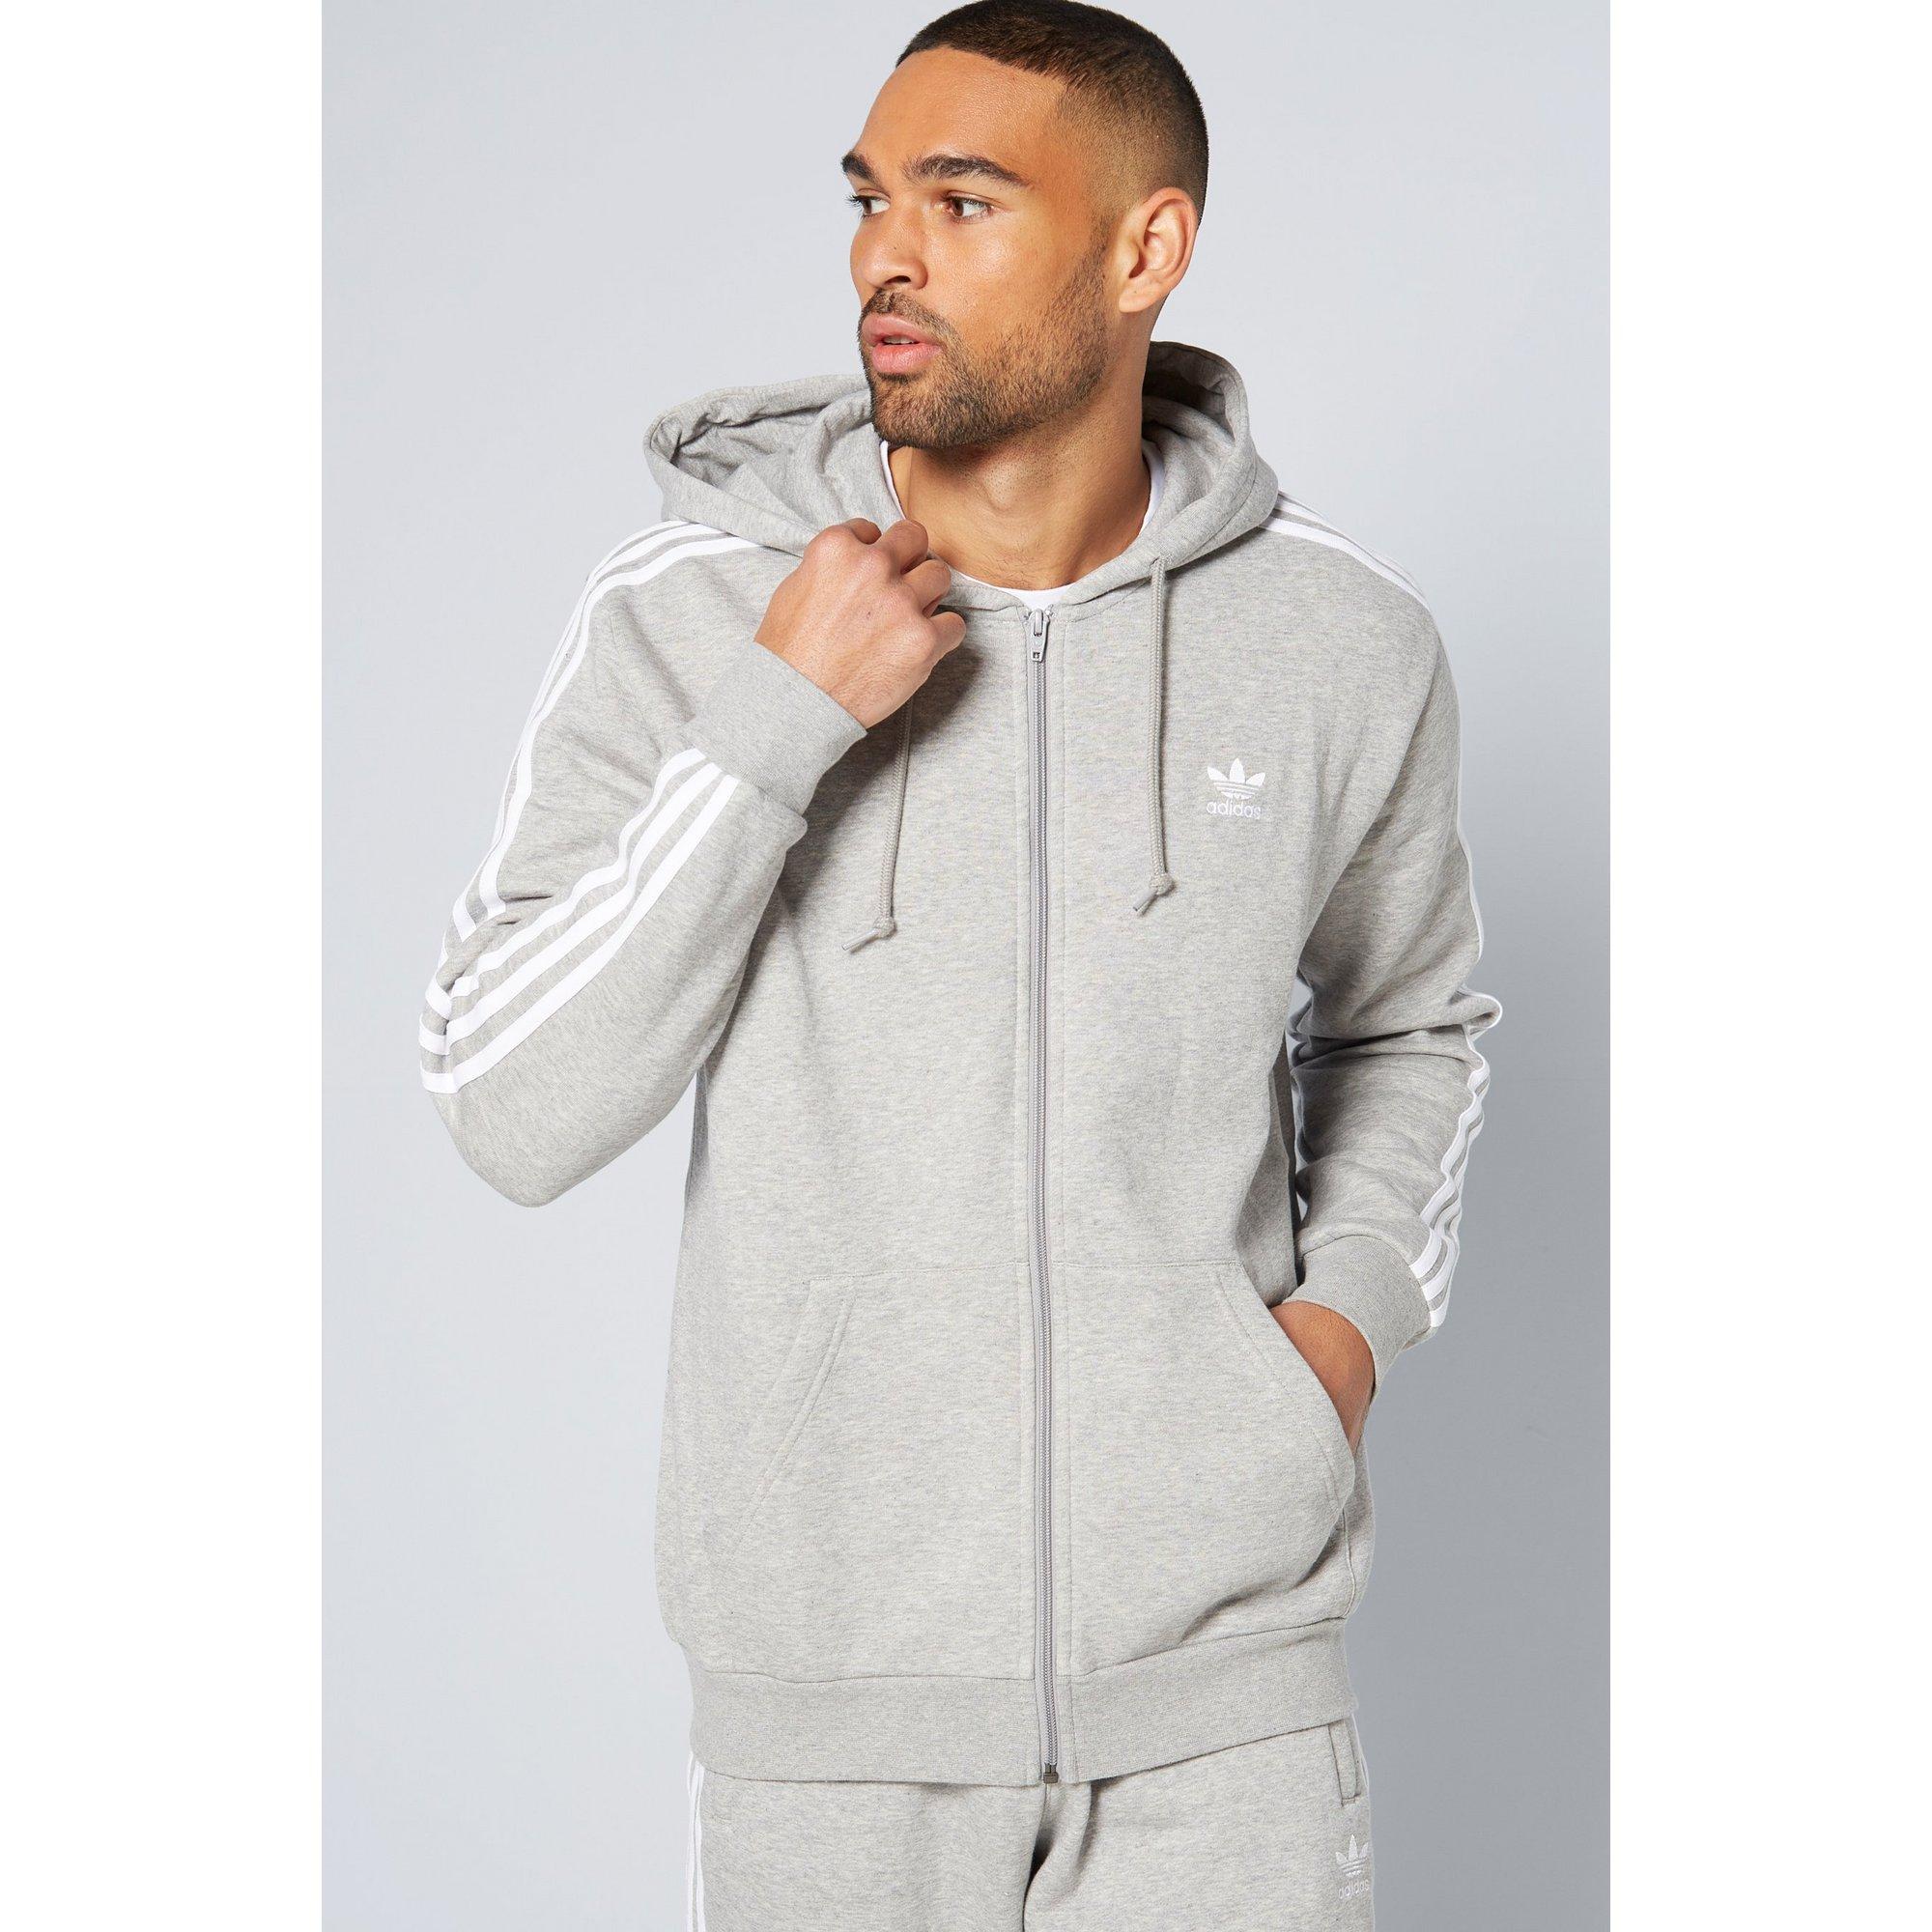 Image of adidas Originals 3 Stripe Zip Through Hoody